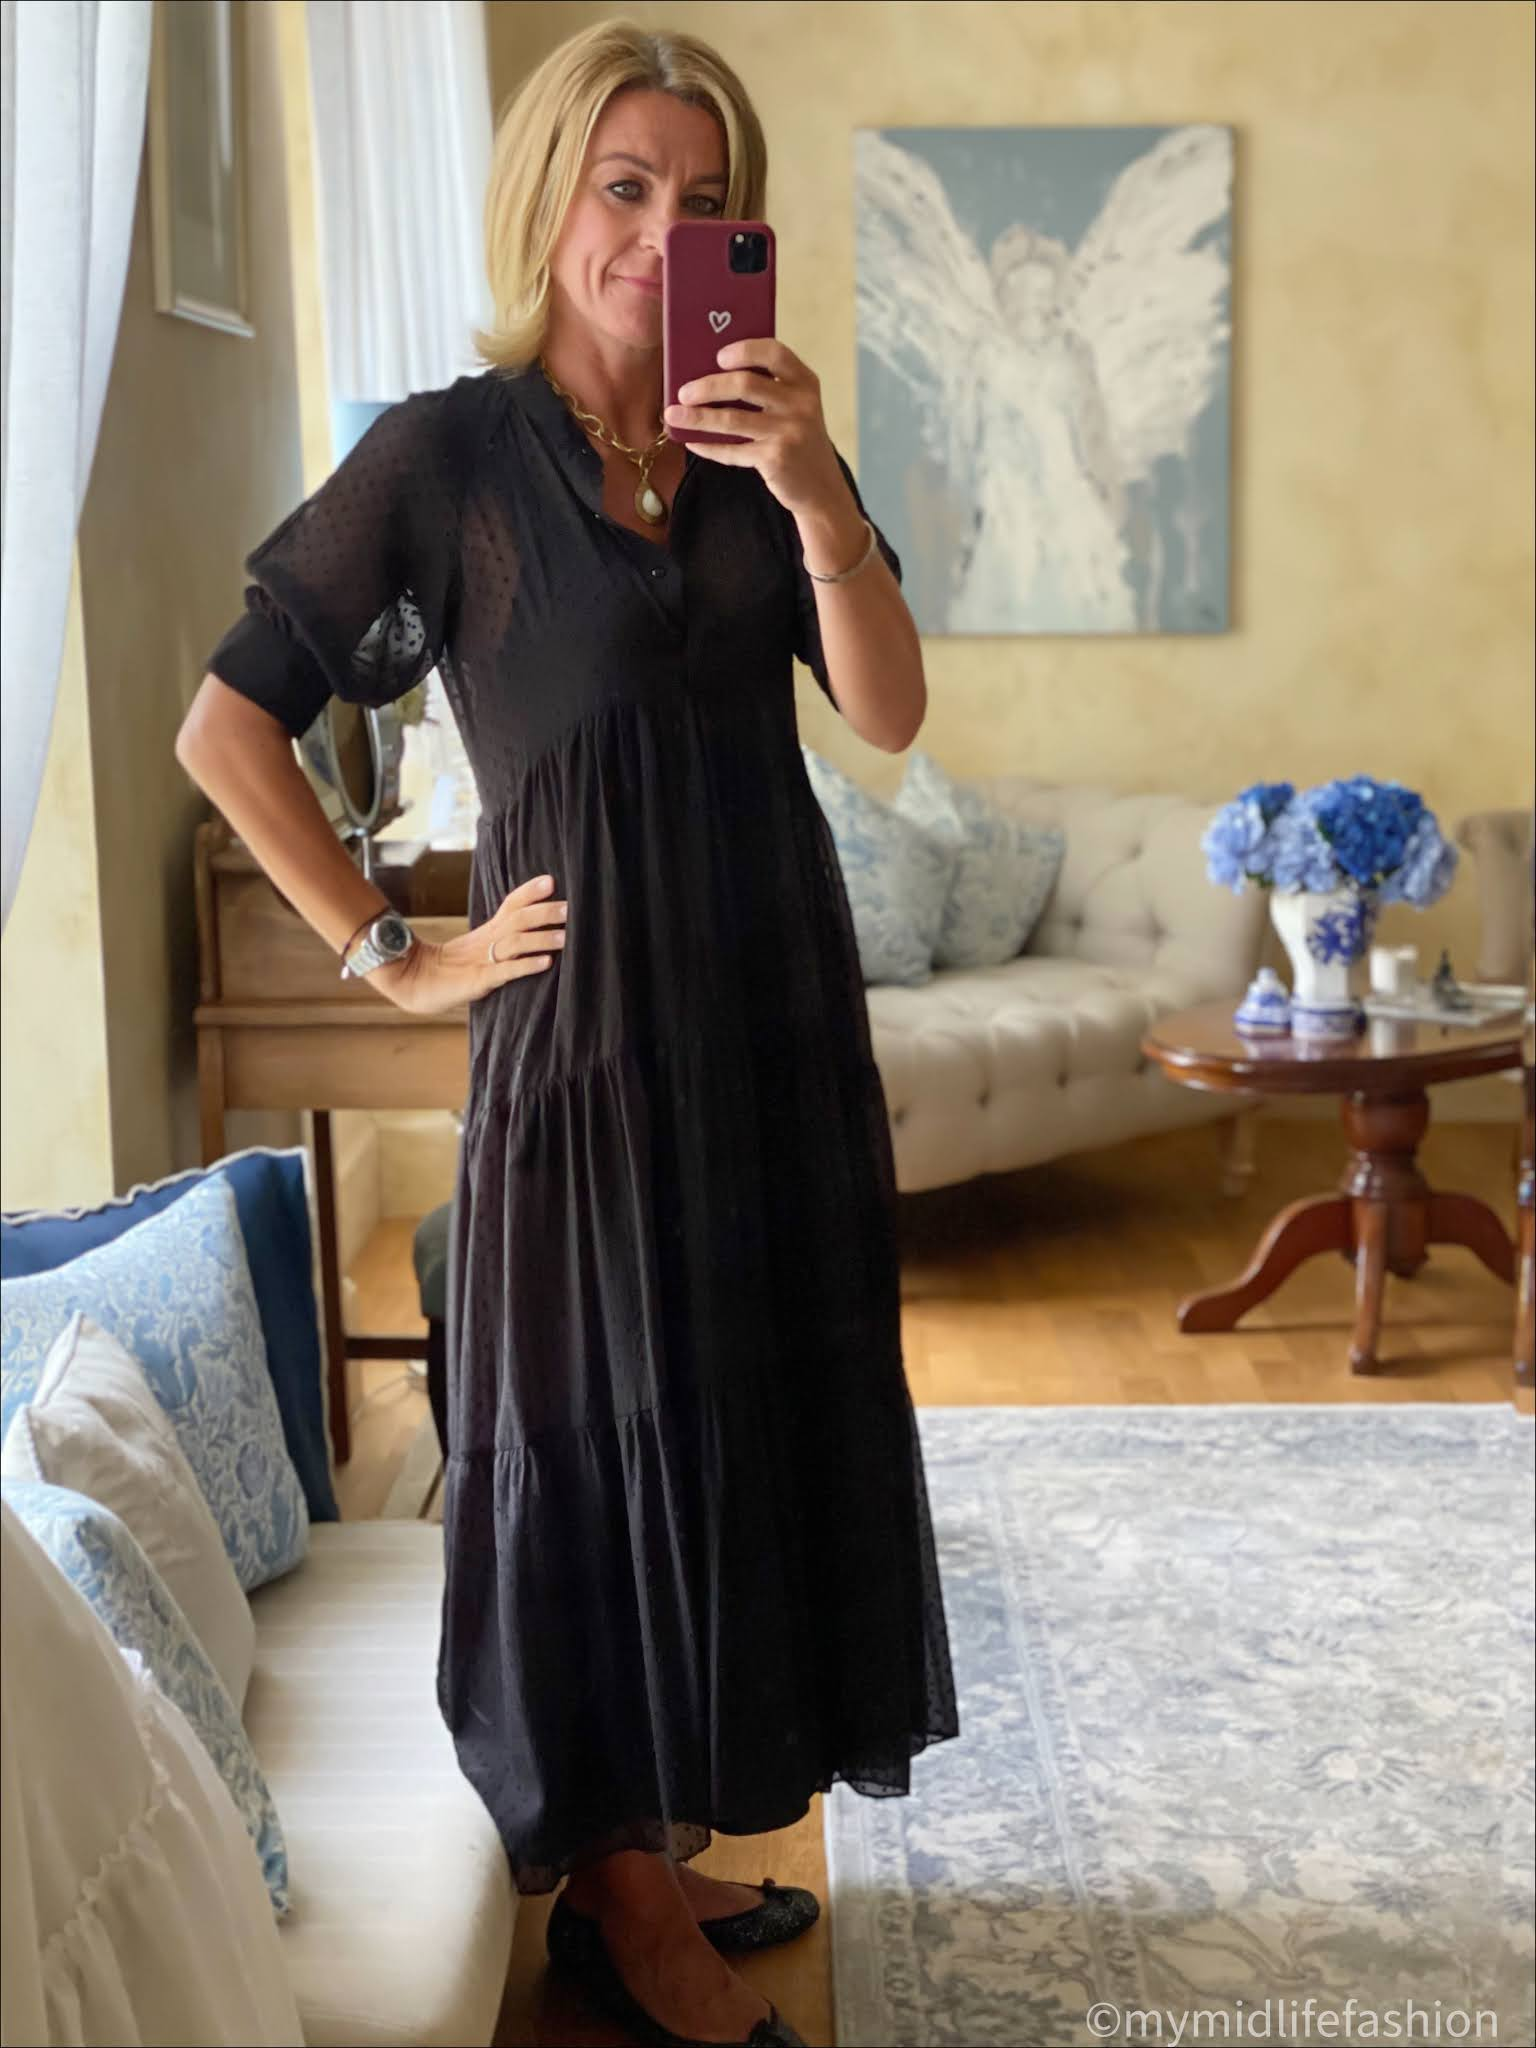 my midlife fashion, Zara dobby tiered short sleeve maxi dress, French sole India glitter ballet pumps